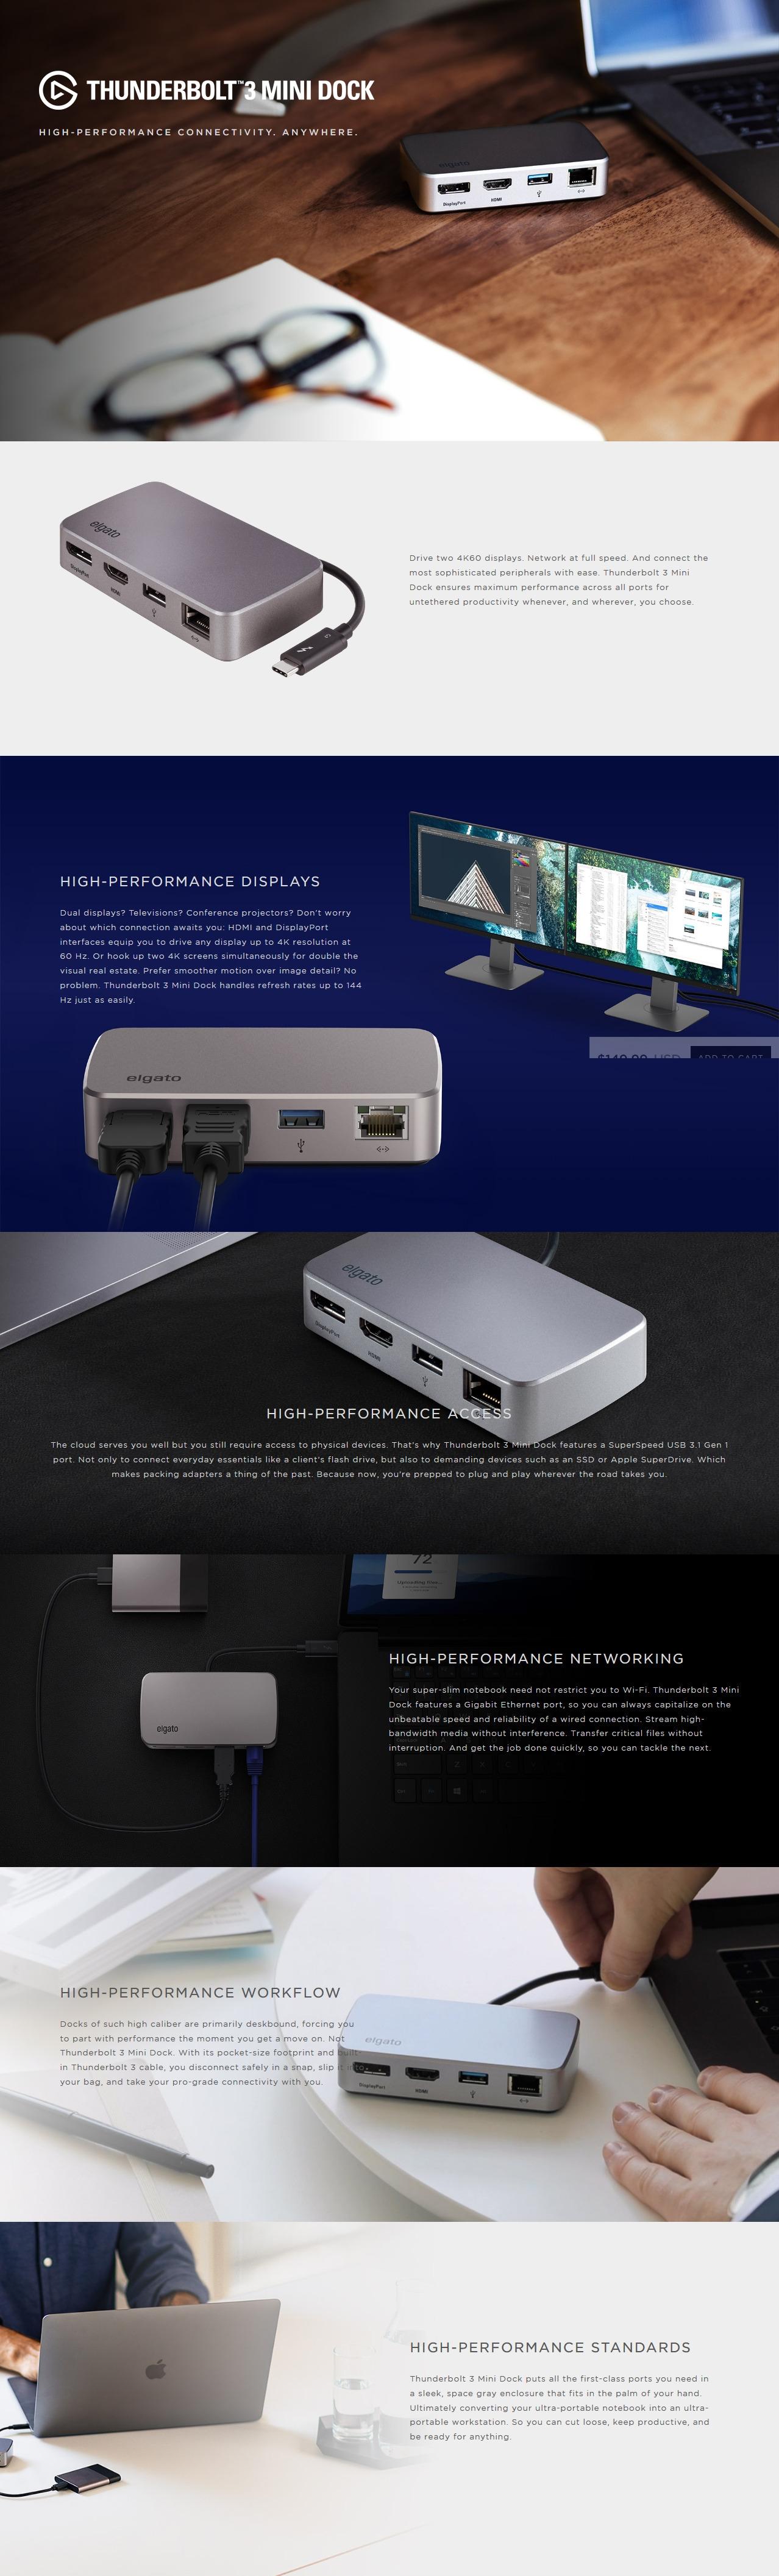 A large marketing image providing additional information about the product Elgato Thunderbolt 3 Mini Docking Station - Additional alt info not provided